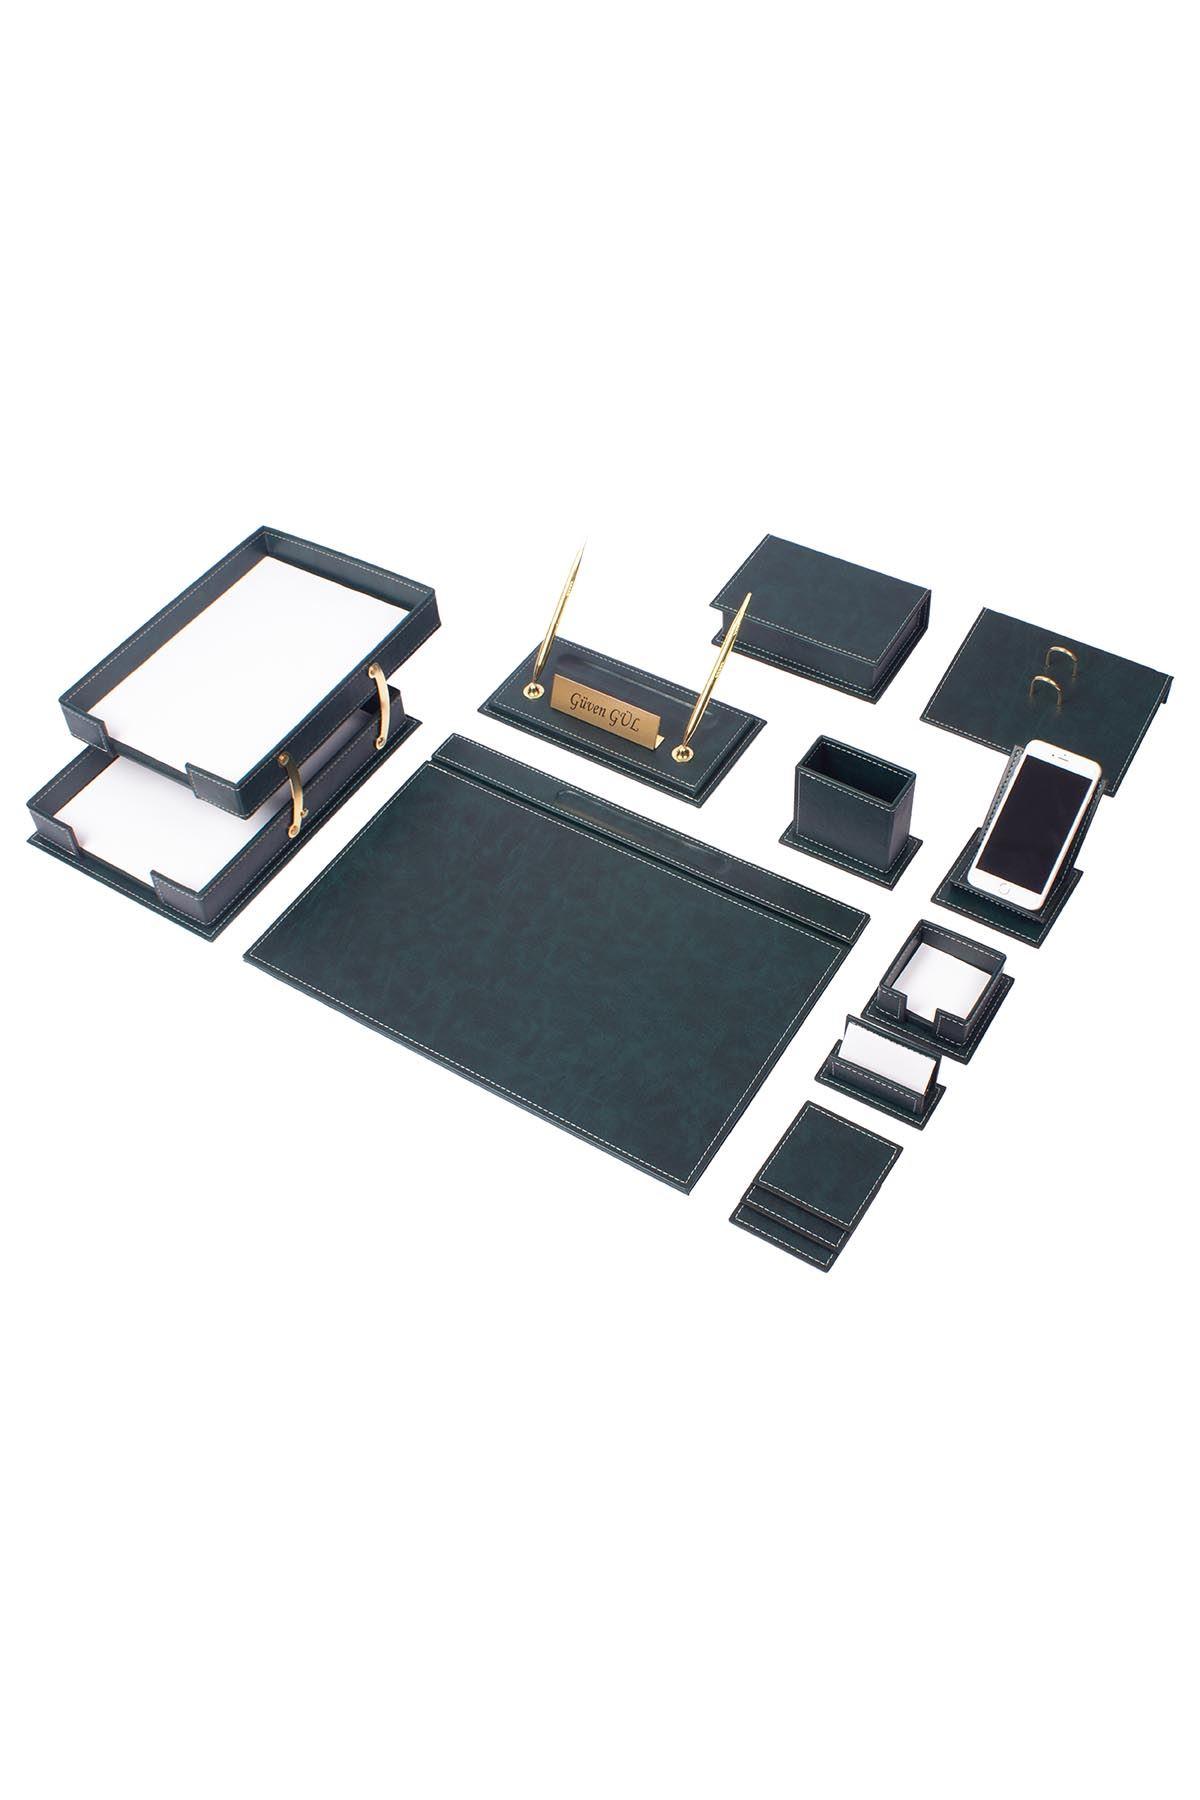 Vega Leather Desk Set Green 14 Accessories